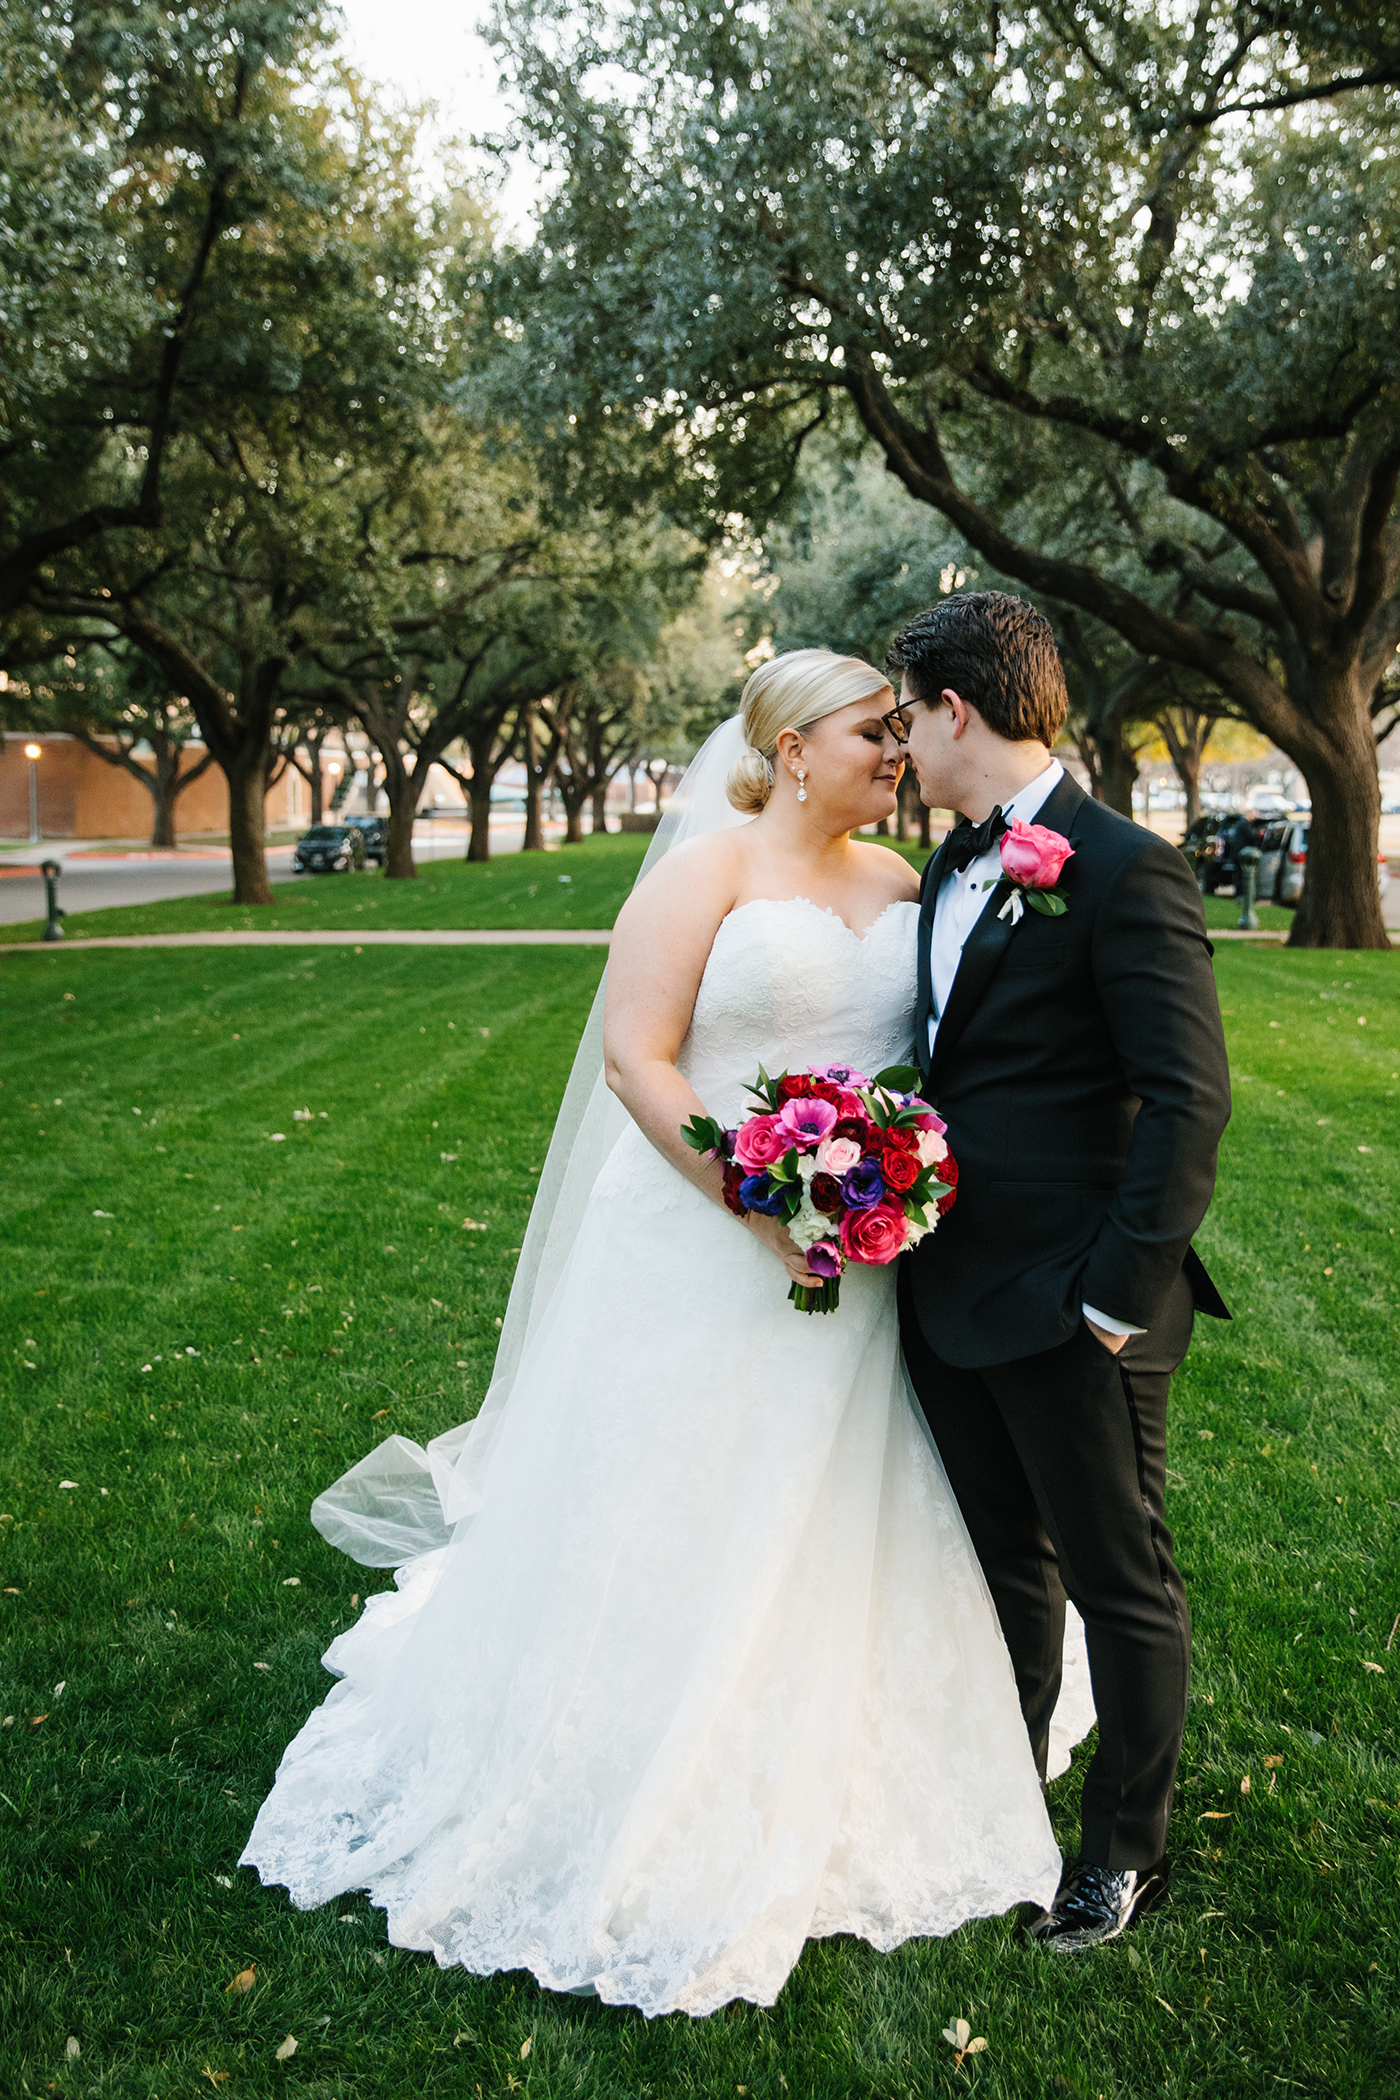 Dallas Weddings Planner - Allday Events - Katie + Matthew at The Adolphus Hotel - 473.jpg